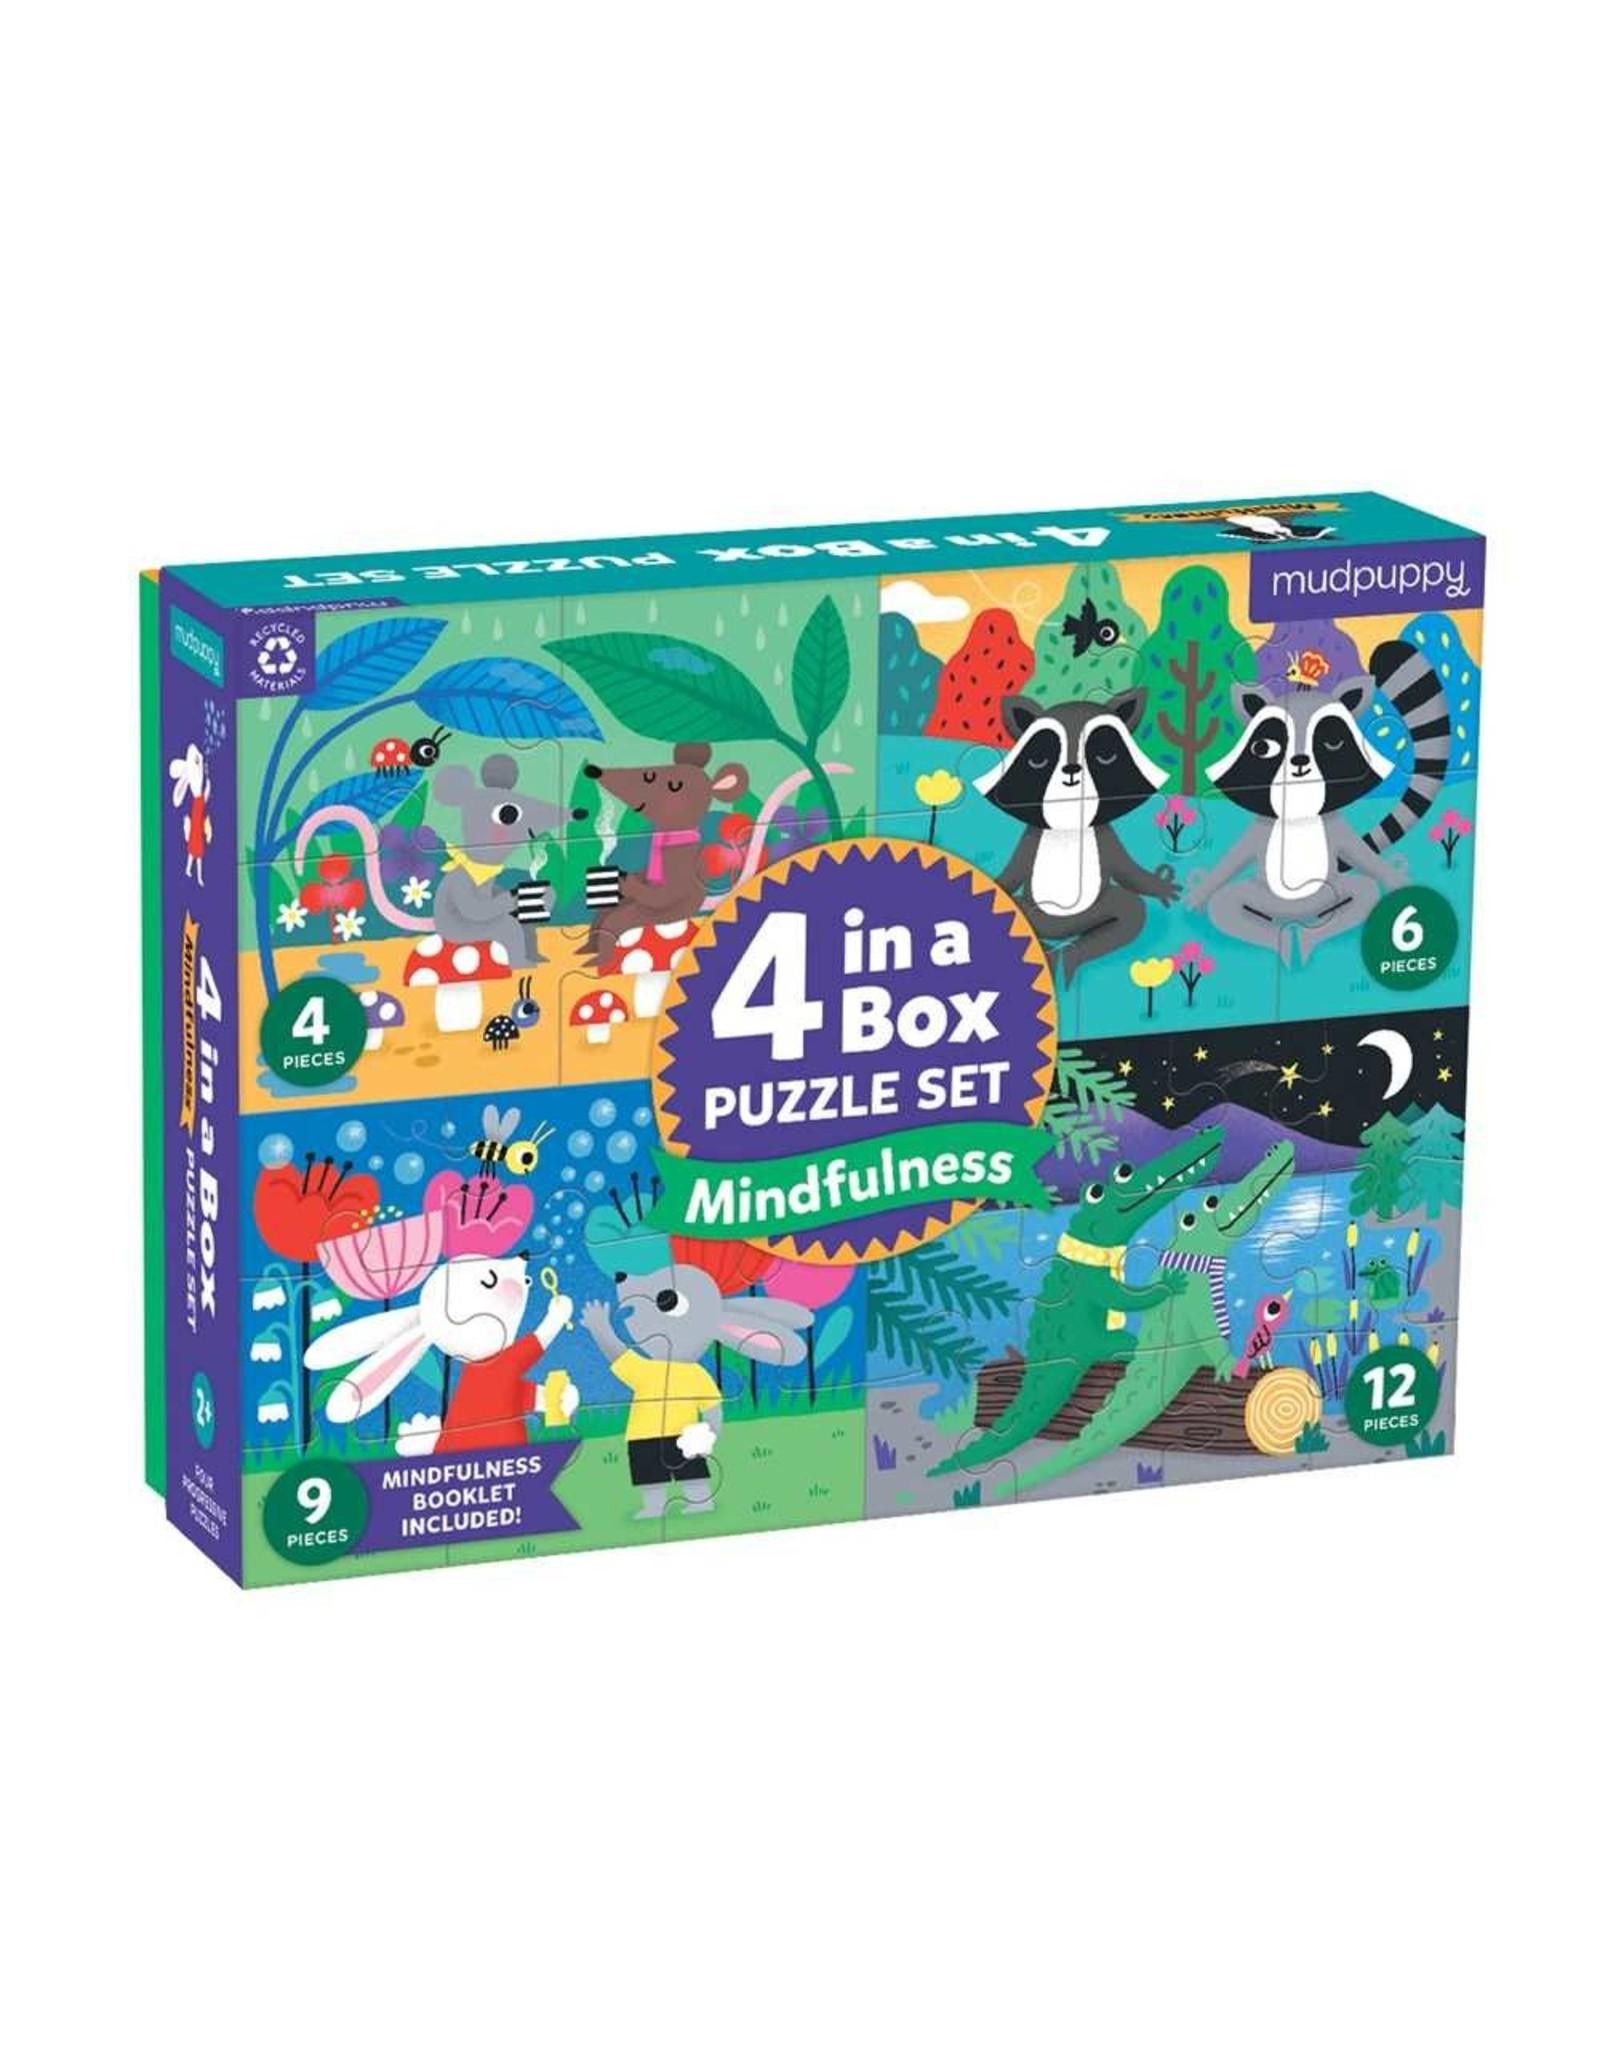 Mudpuppy Mindfulness 4-in-a-box Puzzle